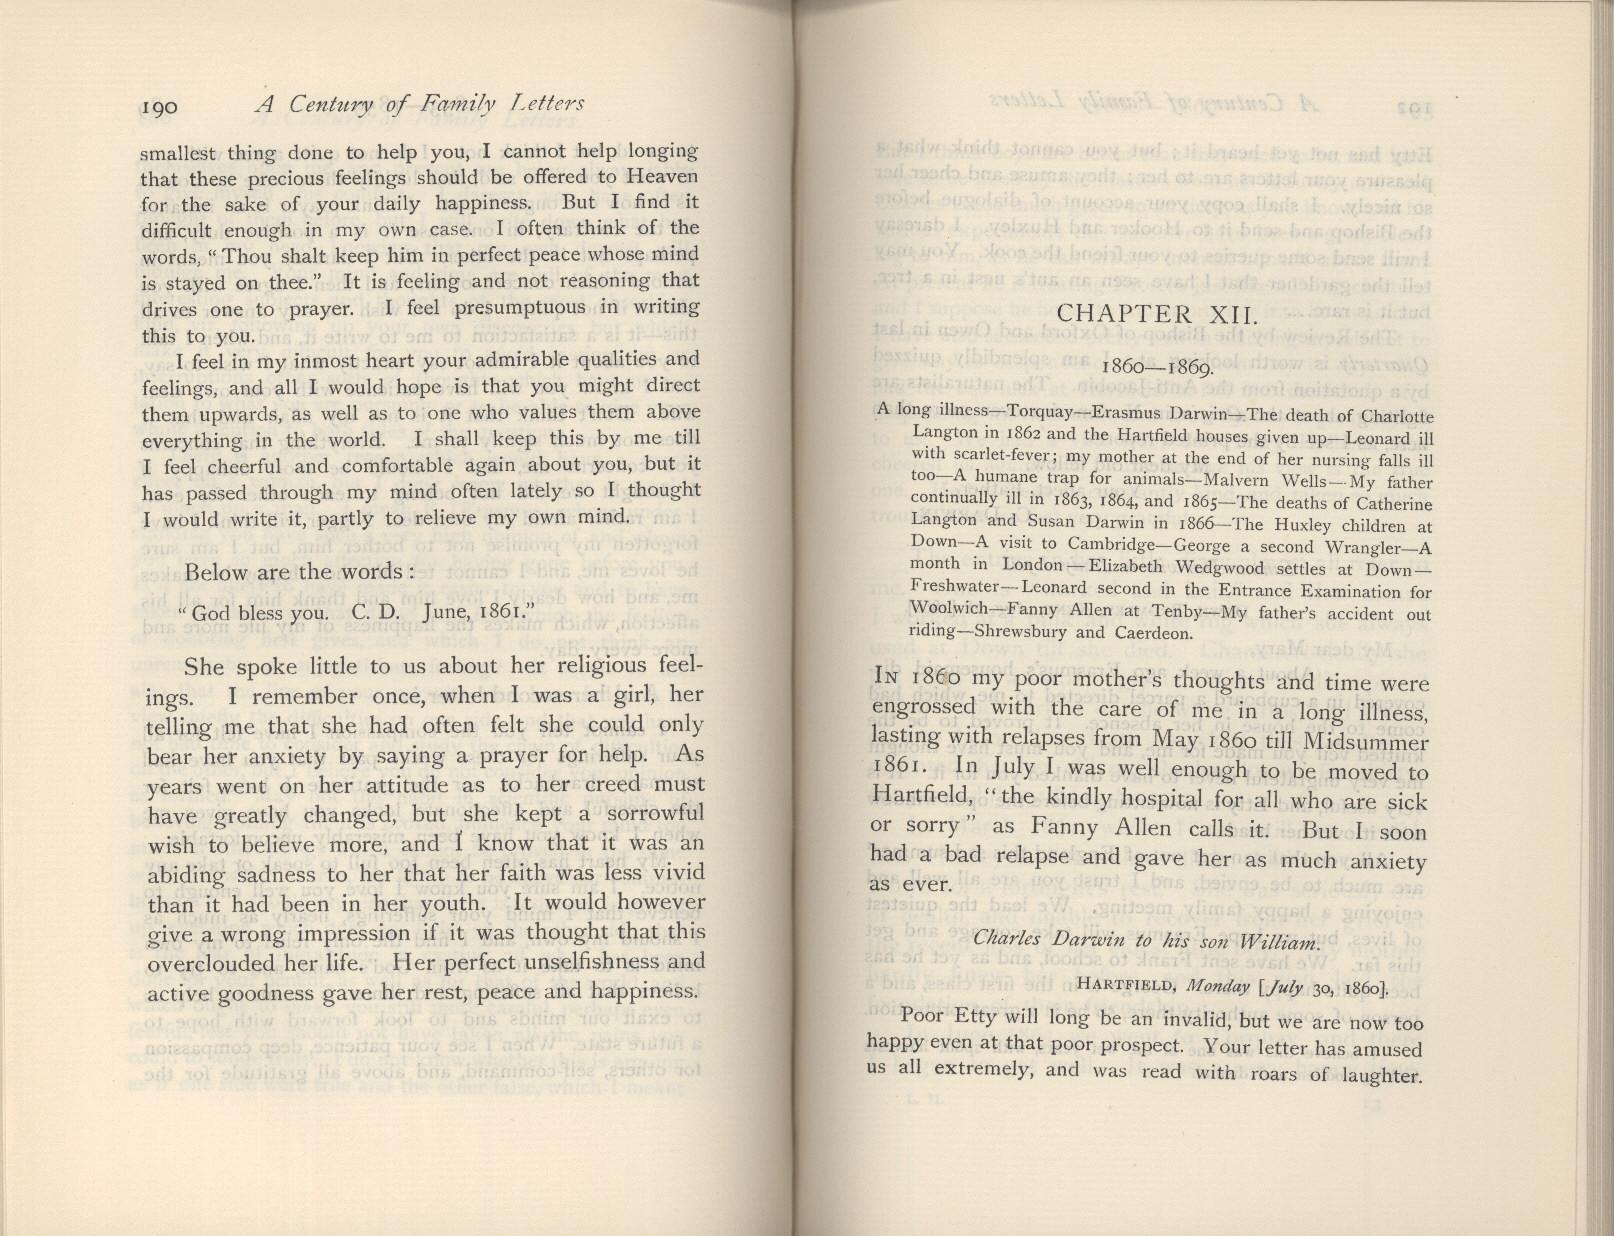 Litchfield, H  E  ed  1904  Emma Darwin, wife of Charles Darwin  A